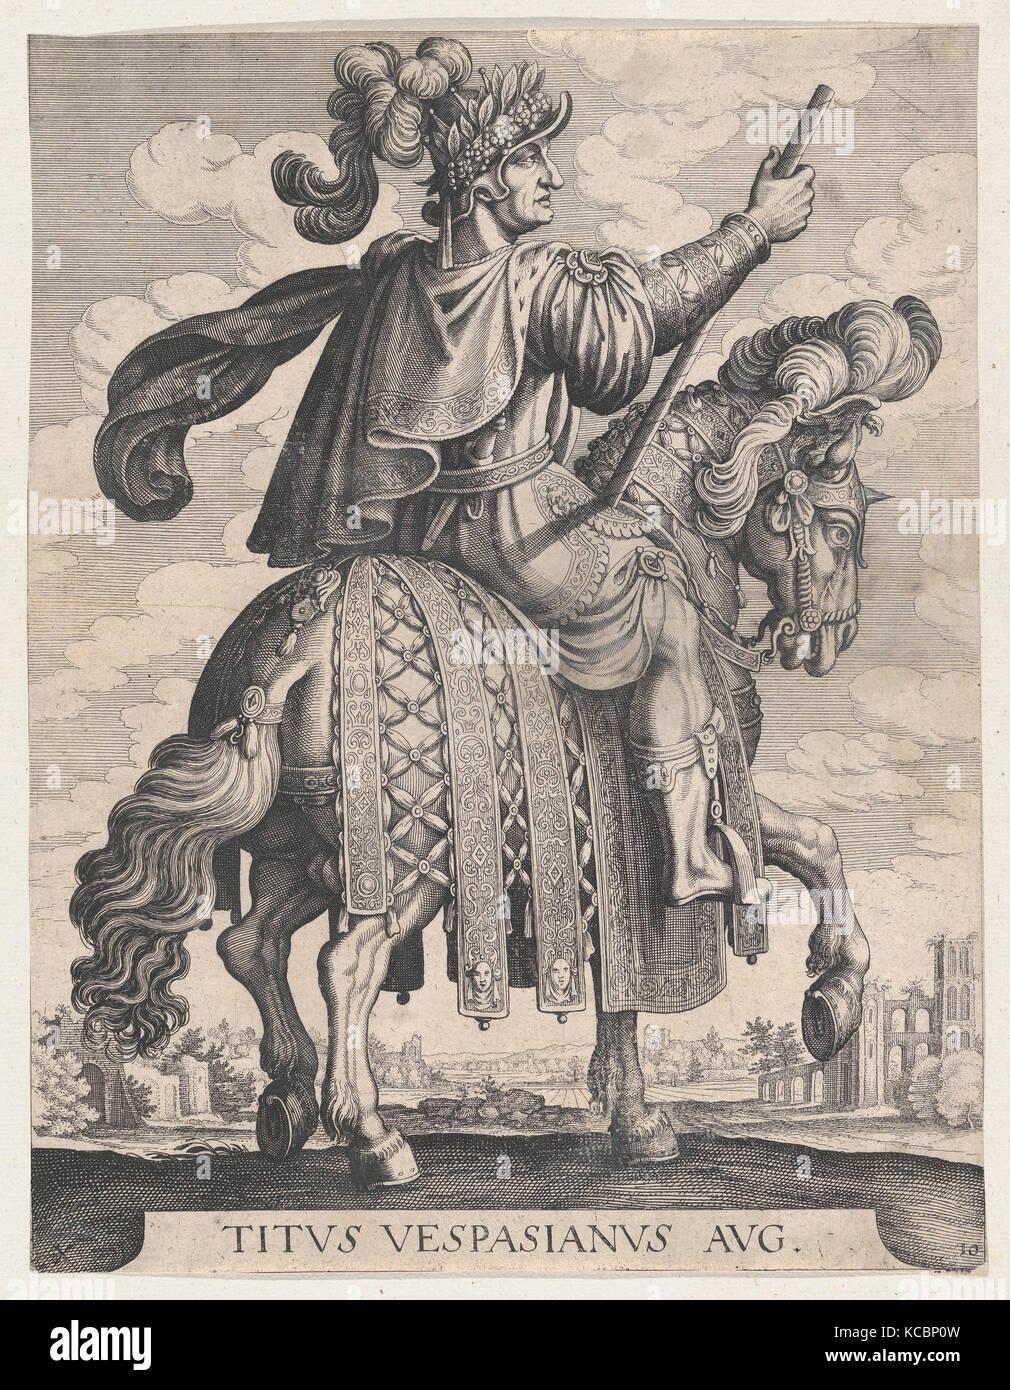 Plate 10: Emperor Titus on Horseback, from 'The First Twelve Roman Caesars' after Tempesta, Matthäus Merian the Elder, 1610–50 Stock Photo